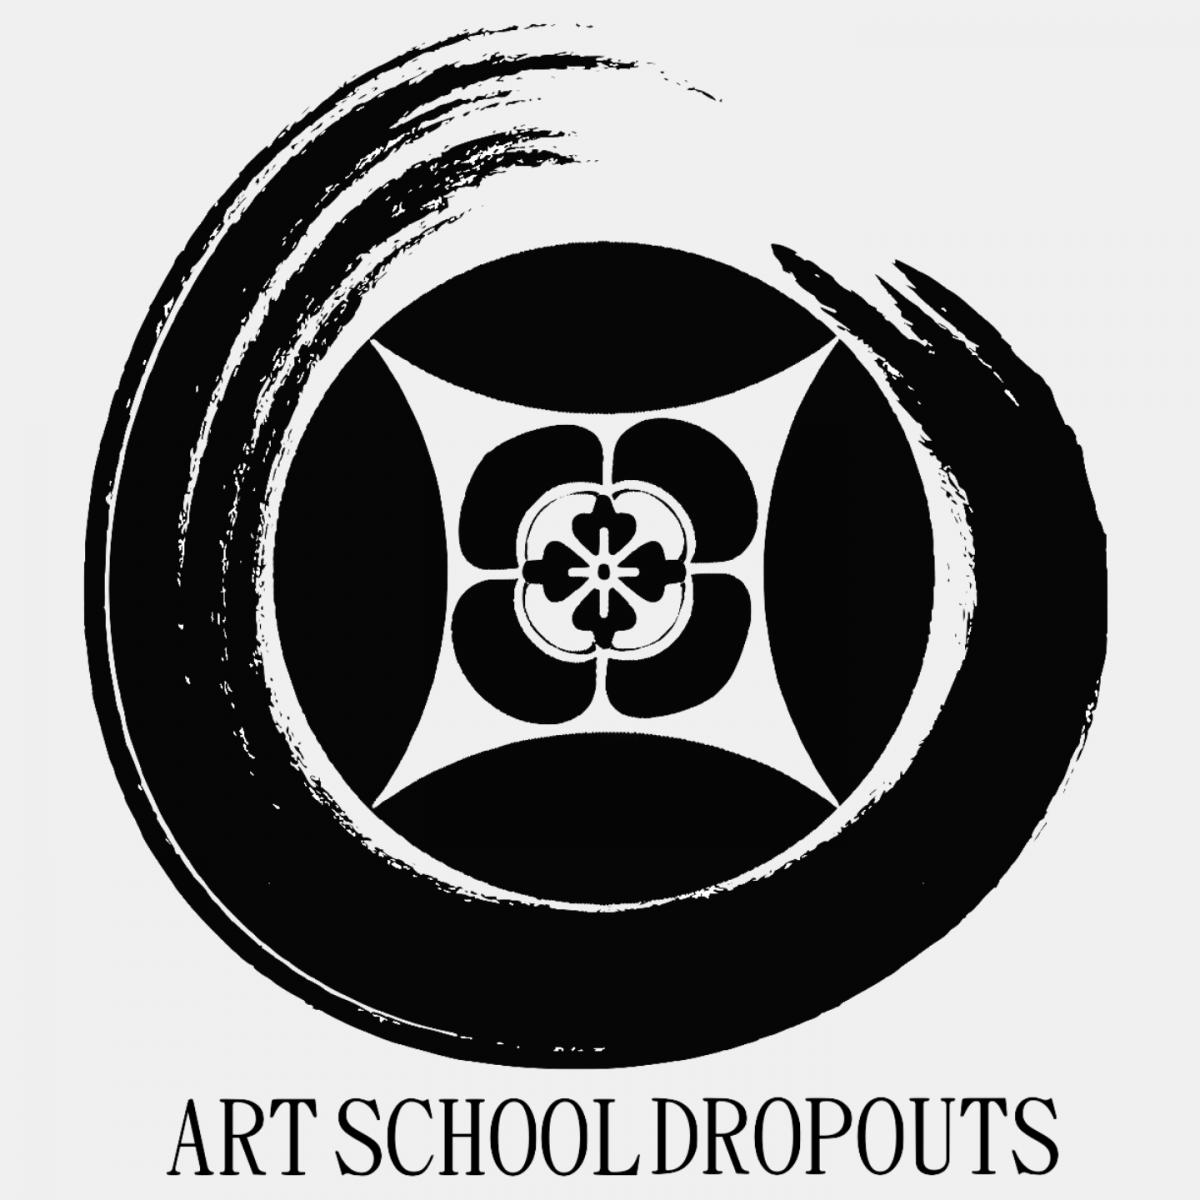 Art School Dropouts